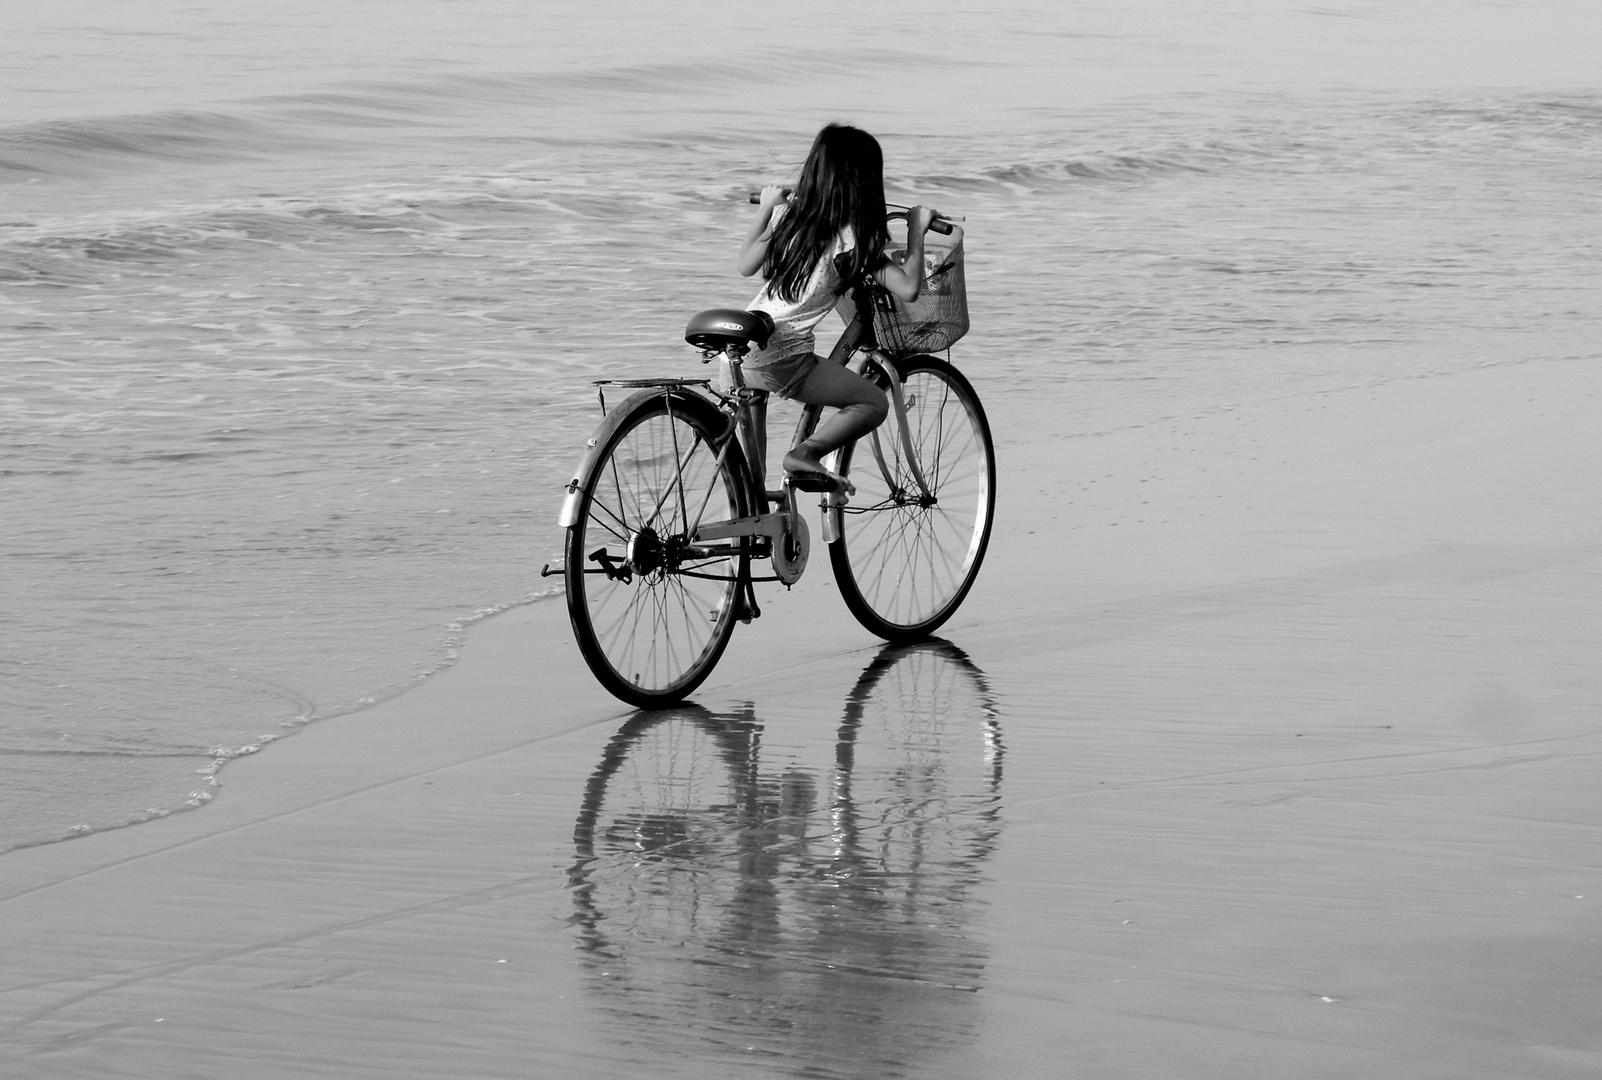 Mit dem Fahrrad dem Strand entlang